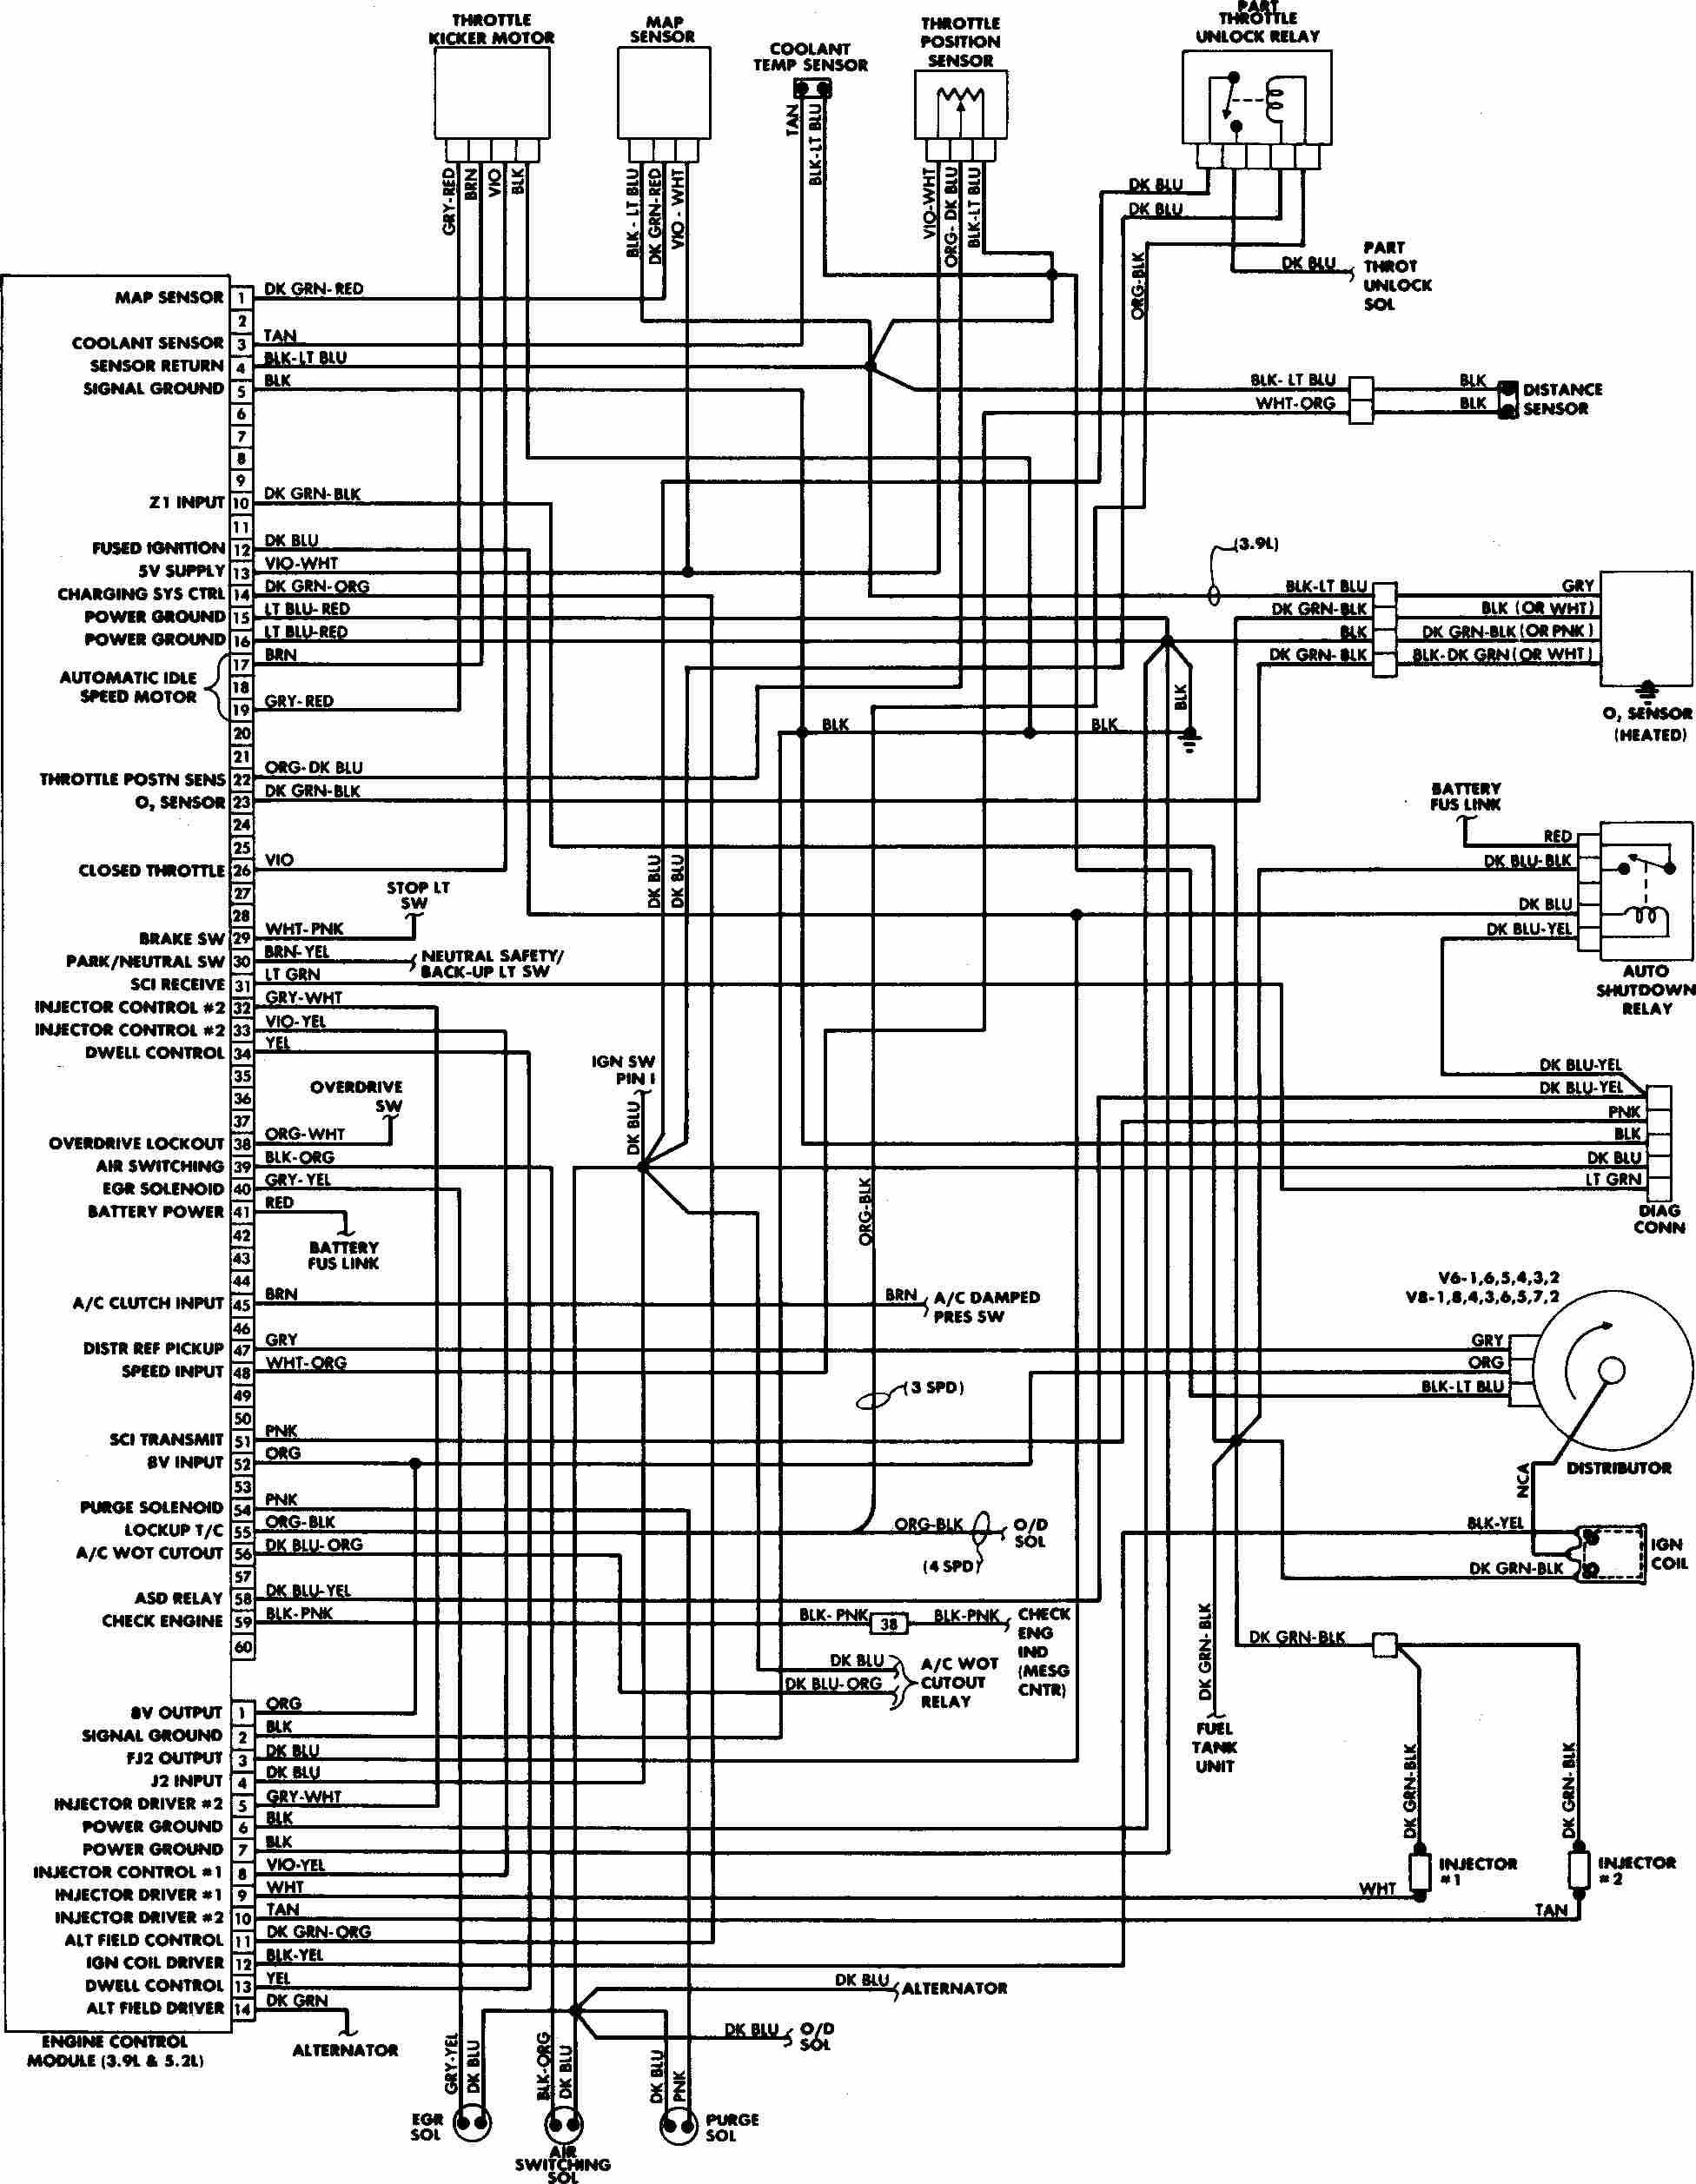 Diagram Of Radiator System 76 Corvette Radiator Diagram 76 Get Free Image About Wiring Diagram Of Diagram Of Radiator System